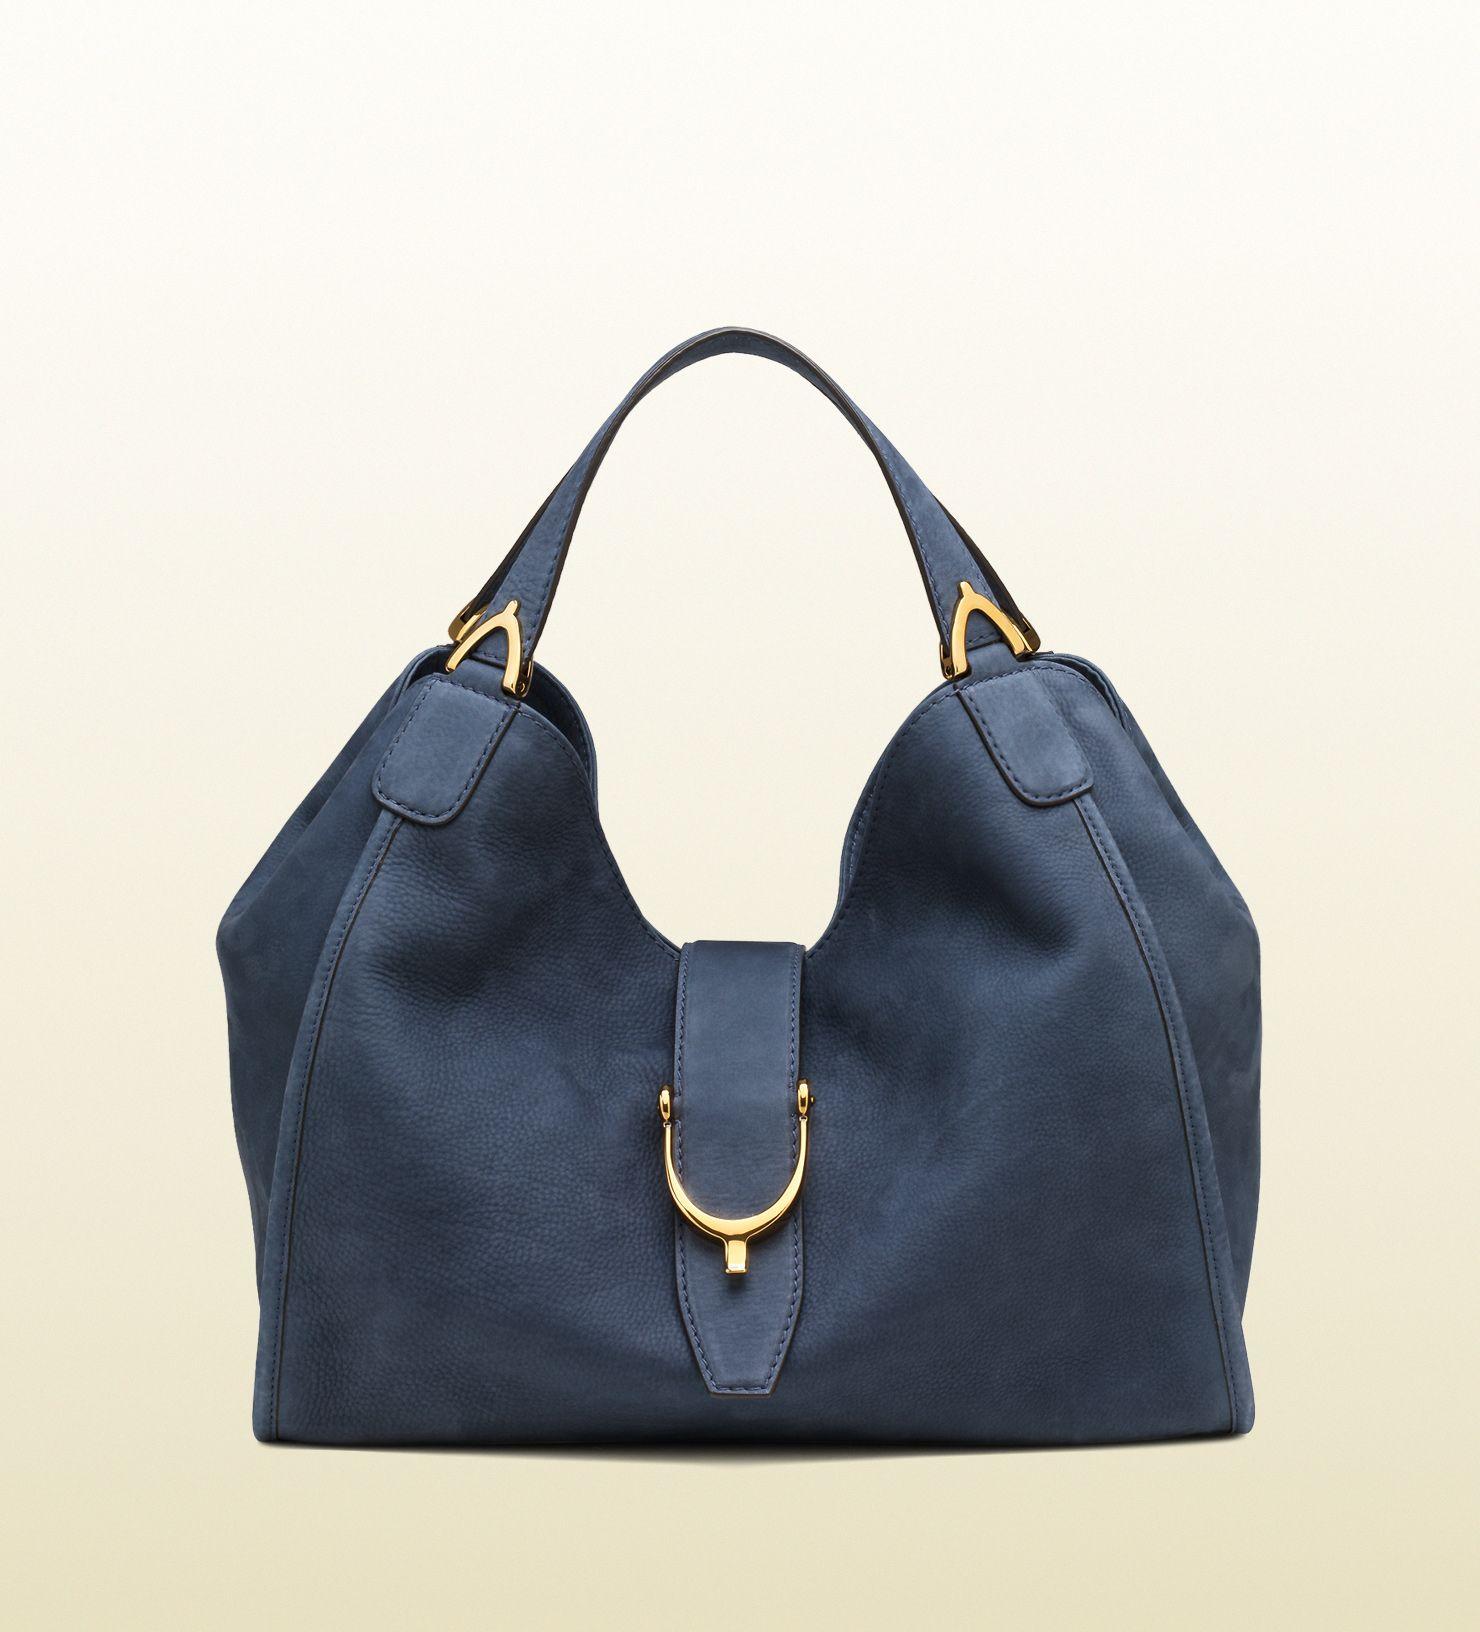 9f0e8916f8 Gucci | soft stirrup suede shoulder bag | Armed and Dangerous ...